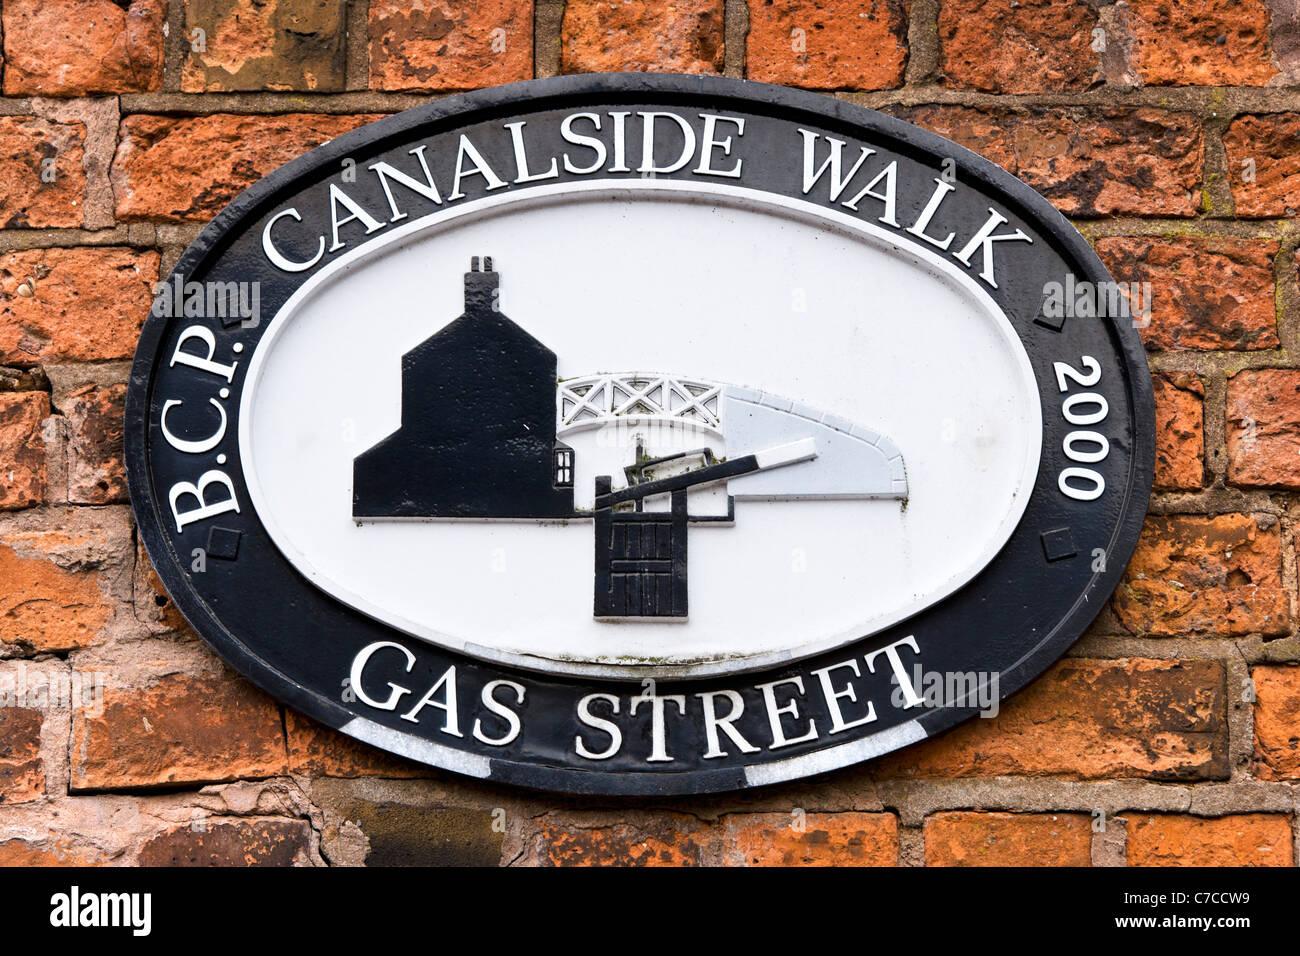 Sign for canalside walk at Gas Street Basin, Birmingham, West Midlands, England, UK - Stock Image